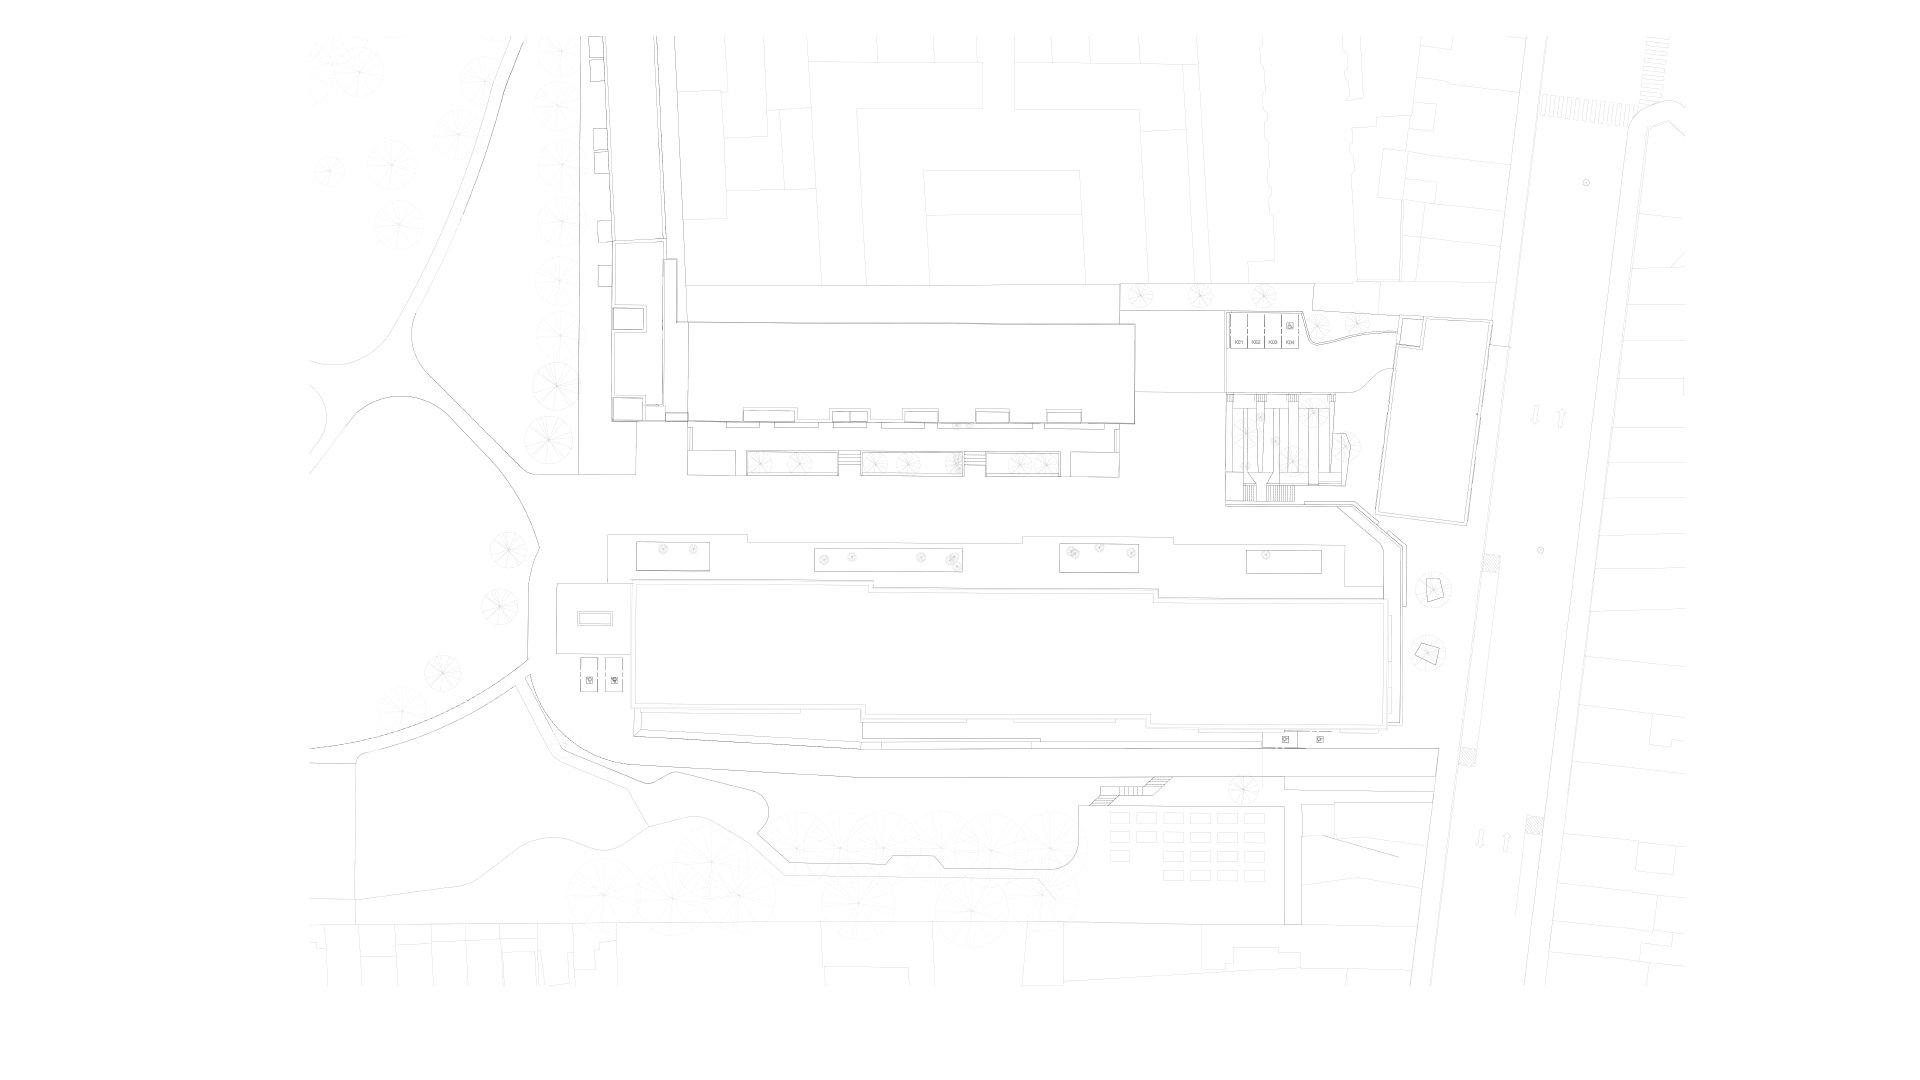 Rauter, plein, Anderlecht-1305322962